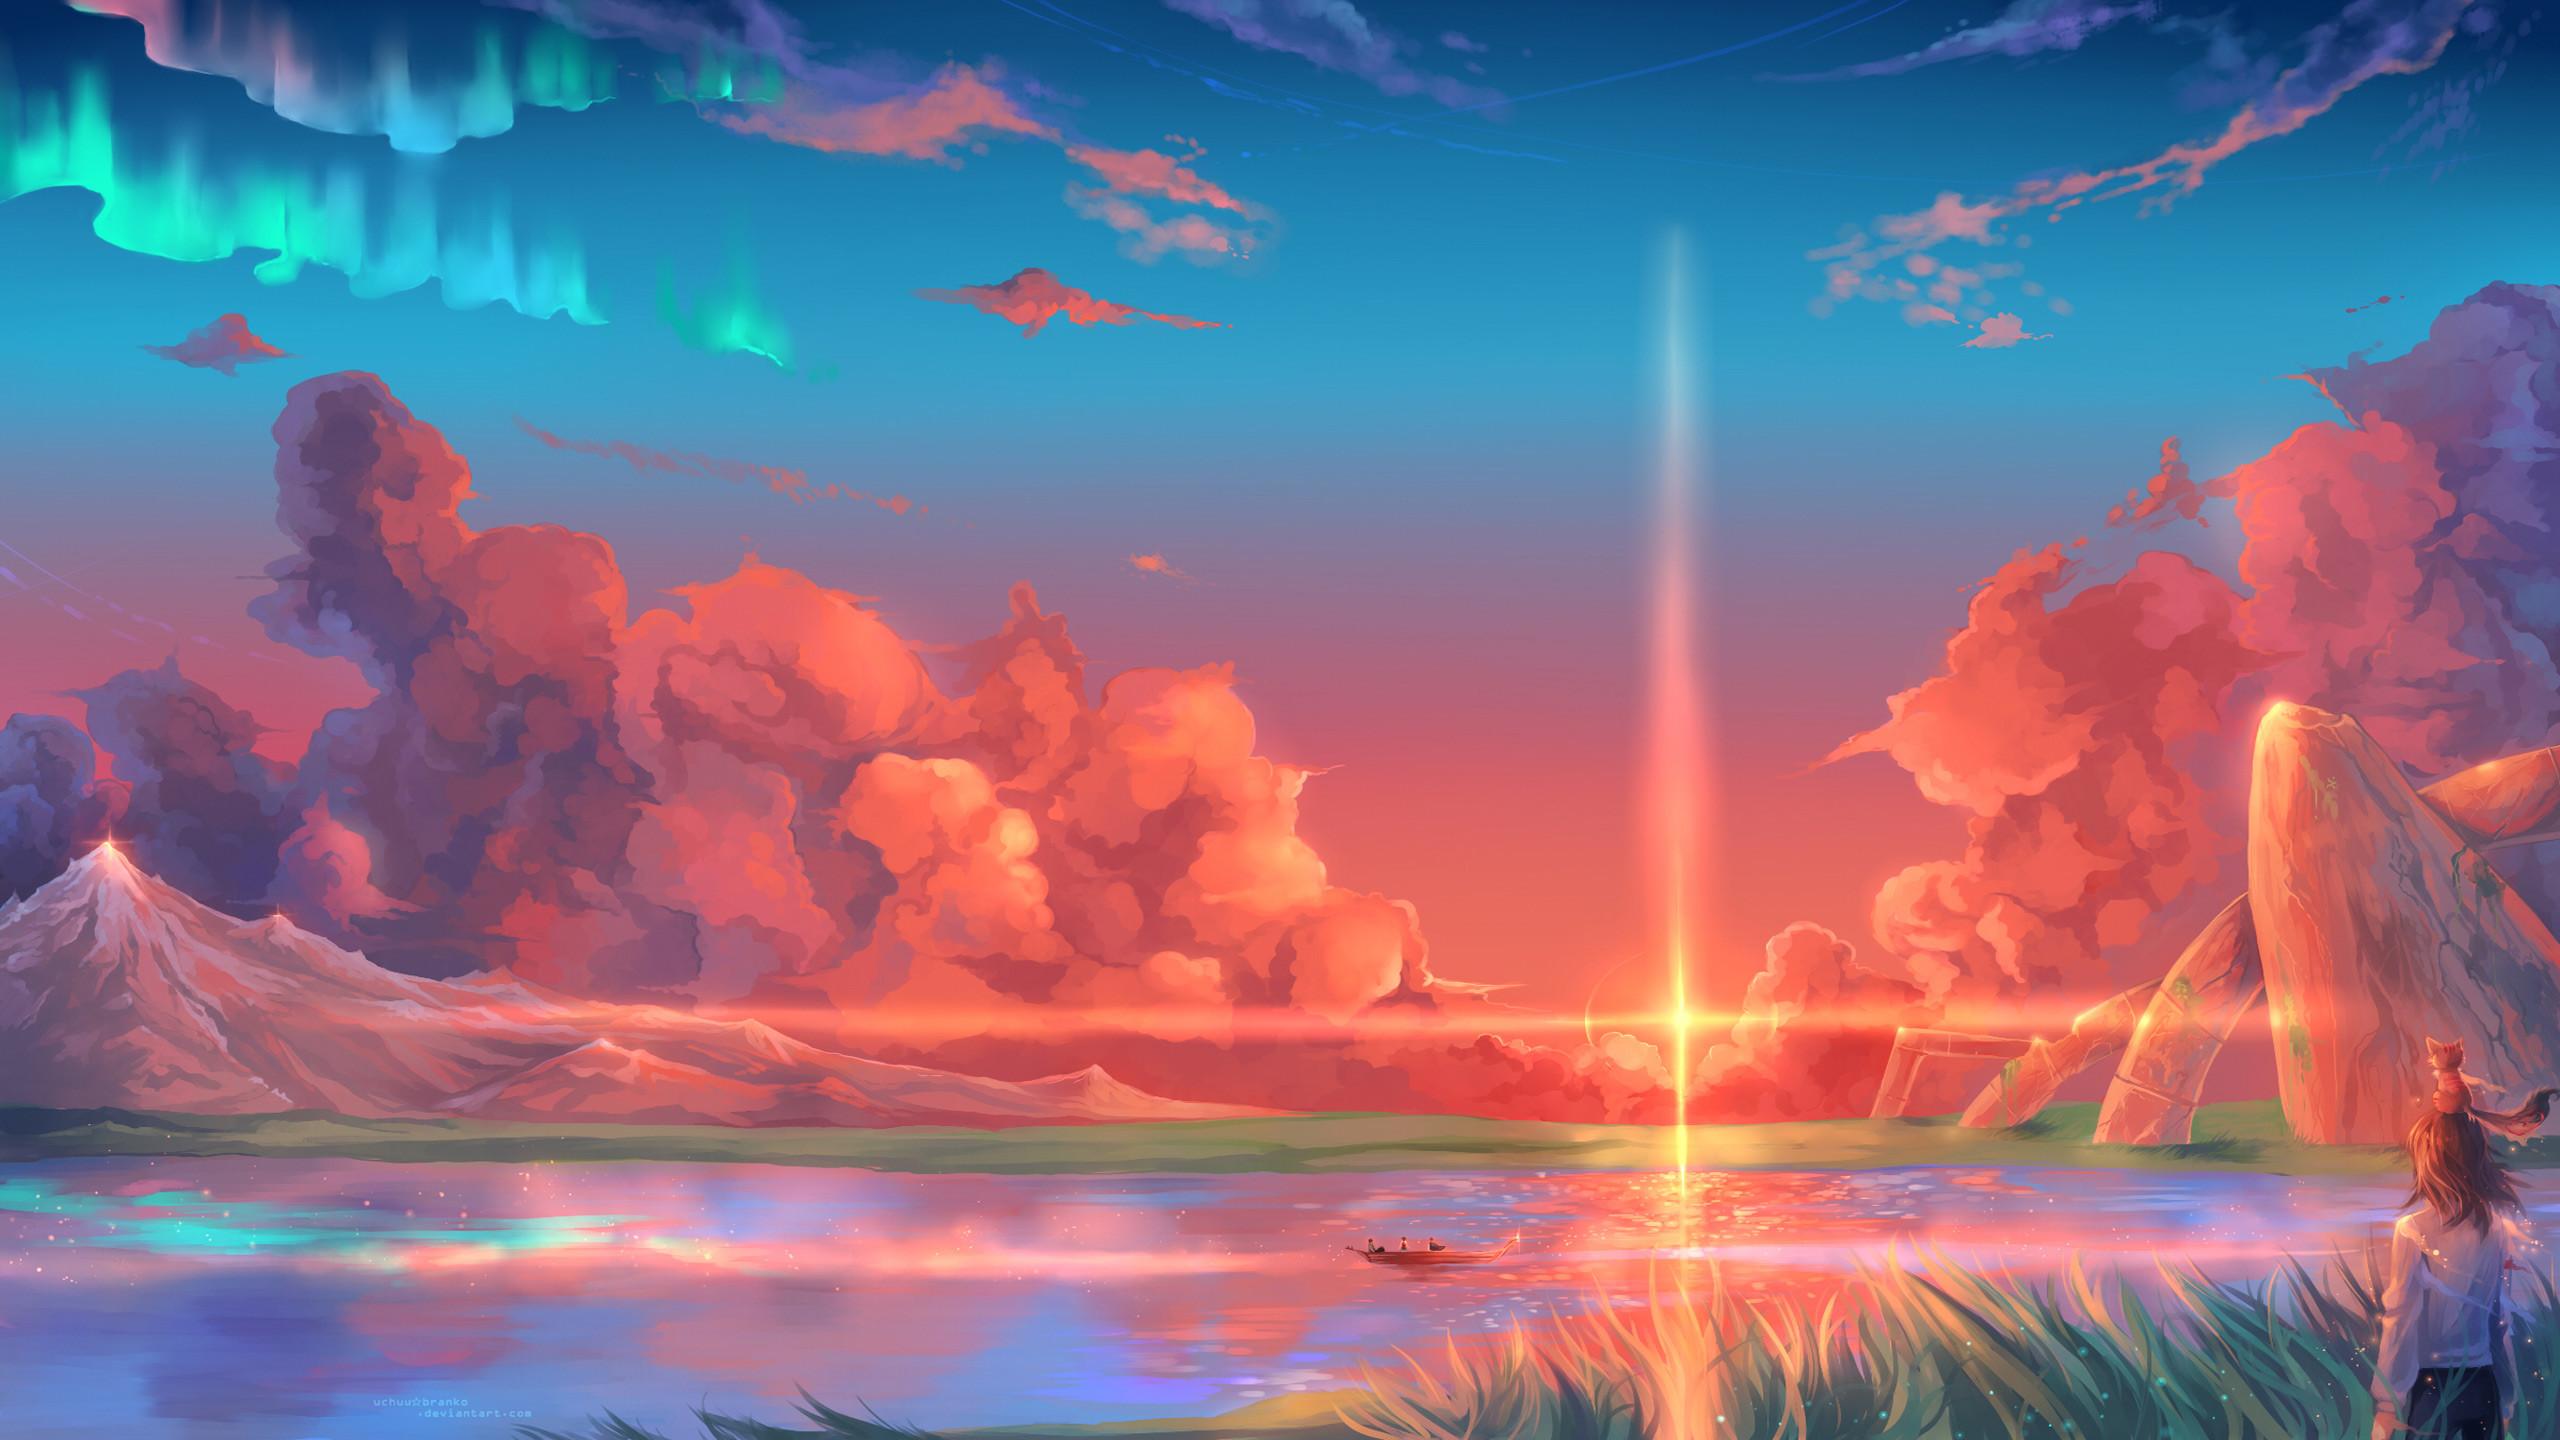 1920x1080 Pretty Anime Scenery Wallpaper 42593